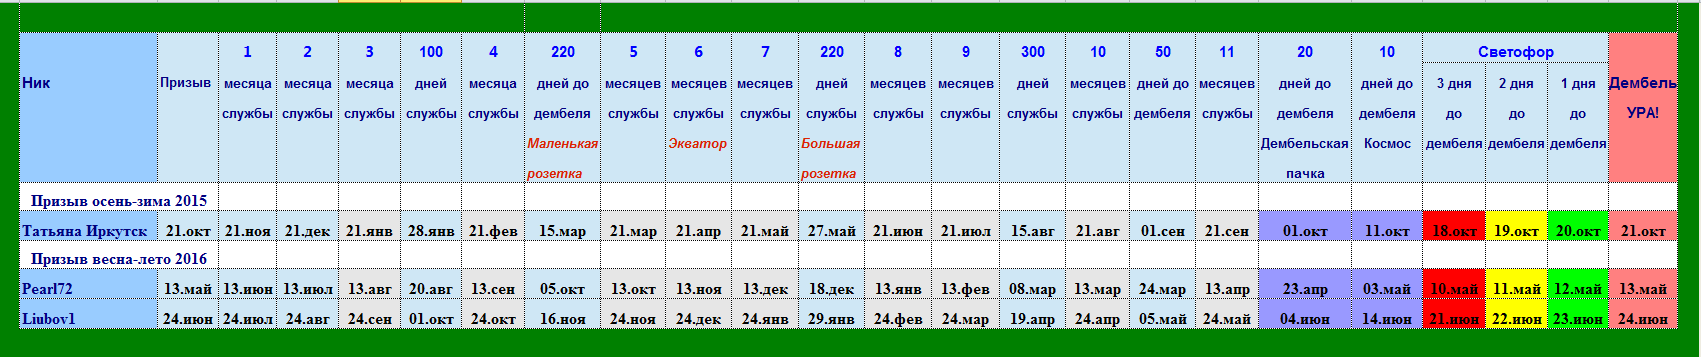 http://s3.uploads.ru/Jg2jw.png